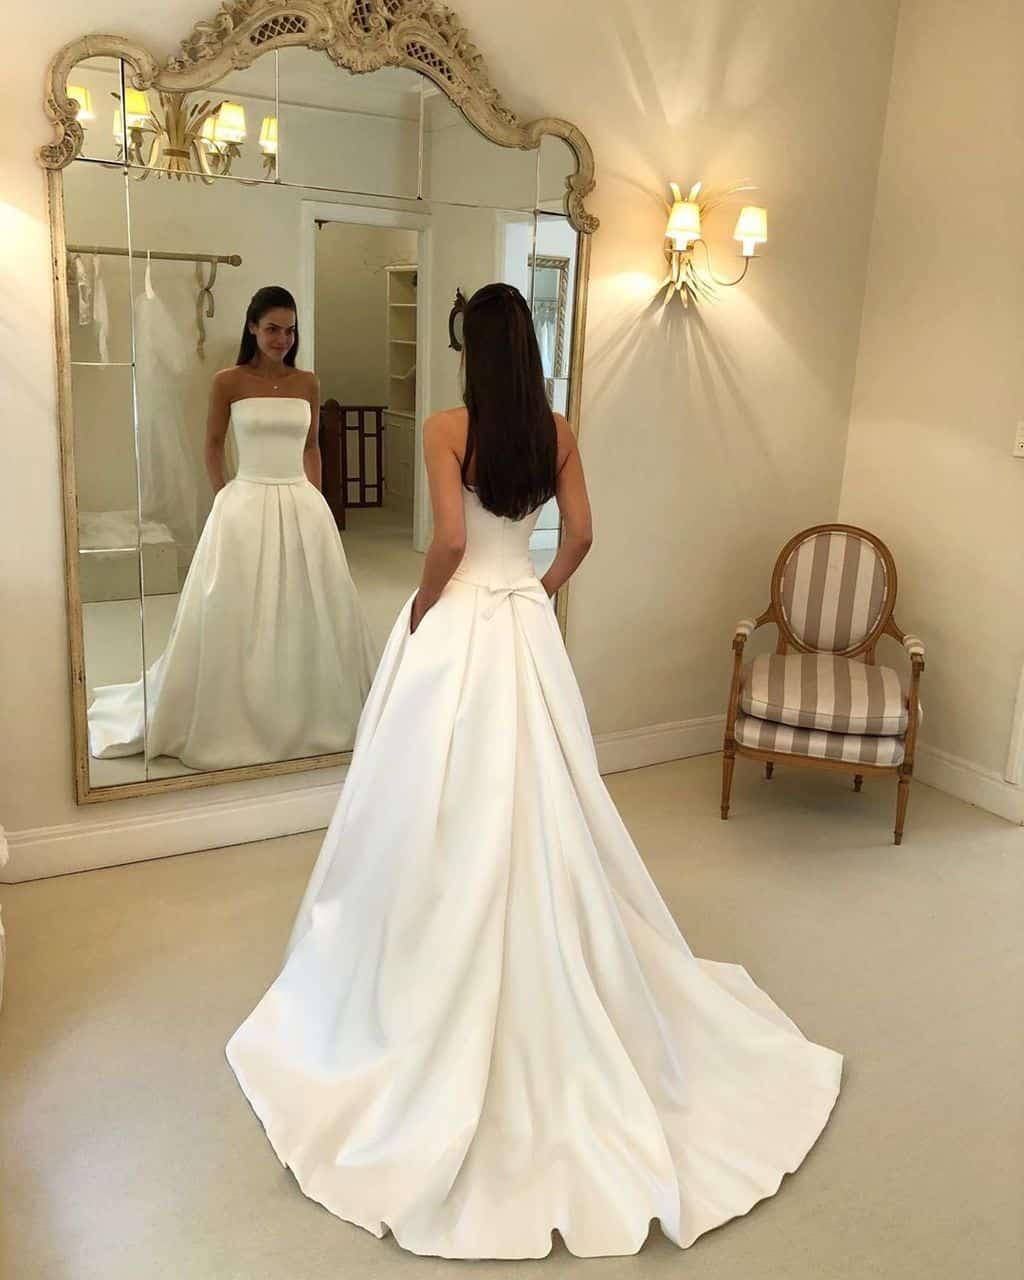 vestido-de-noiva-sem-renda-wanda-borges